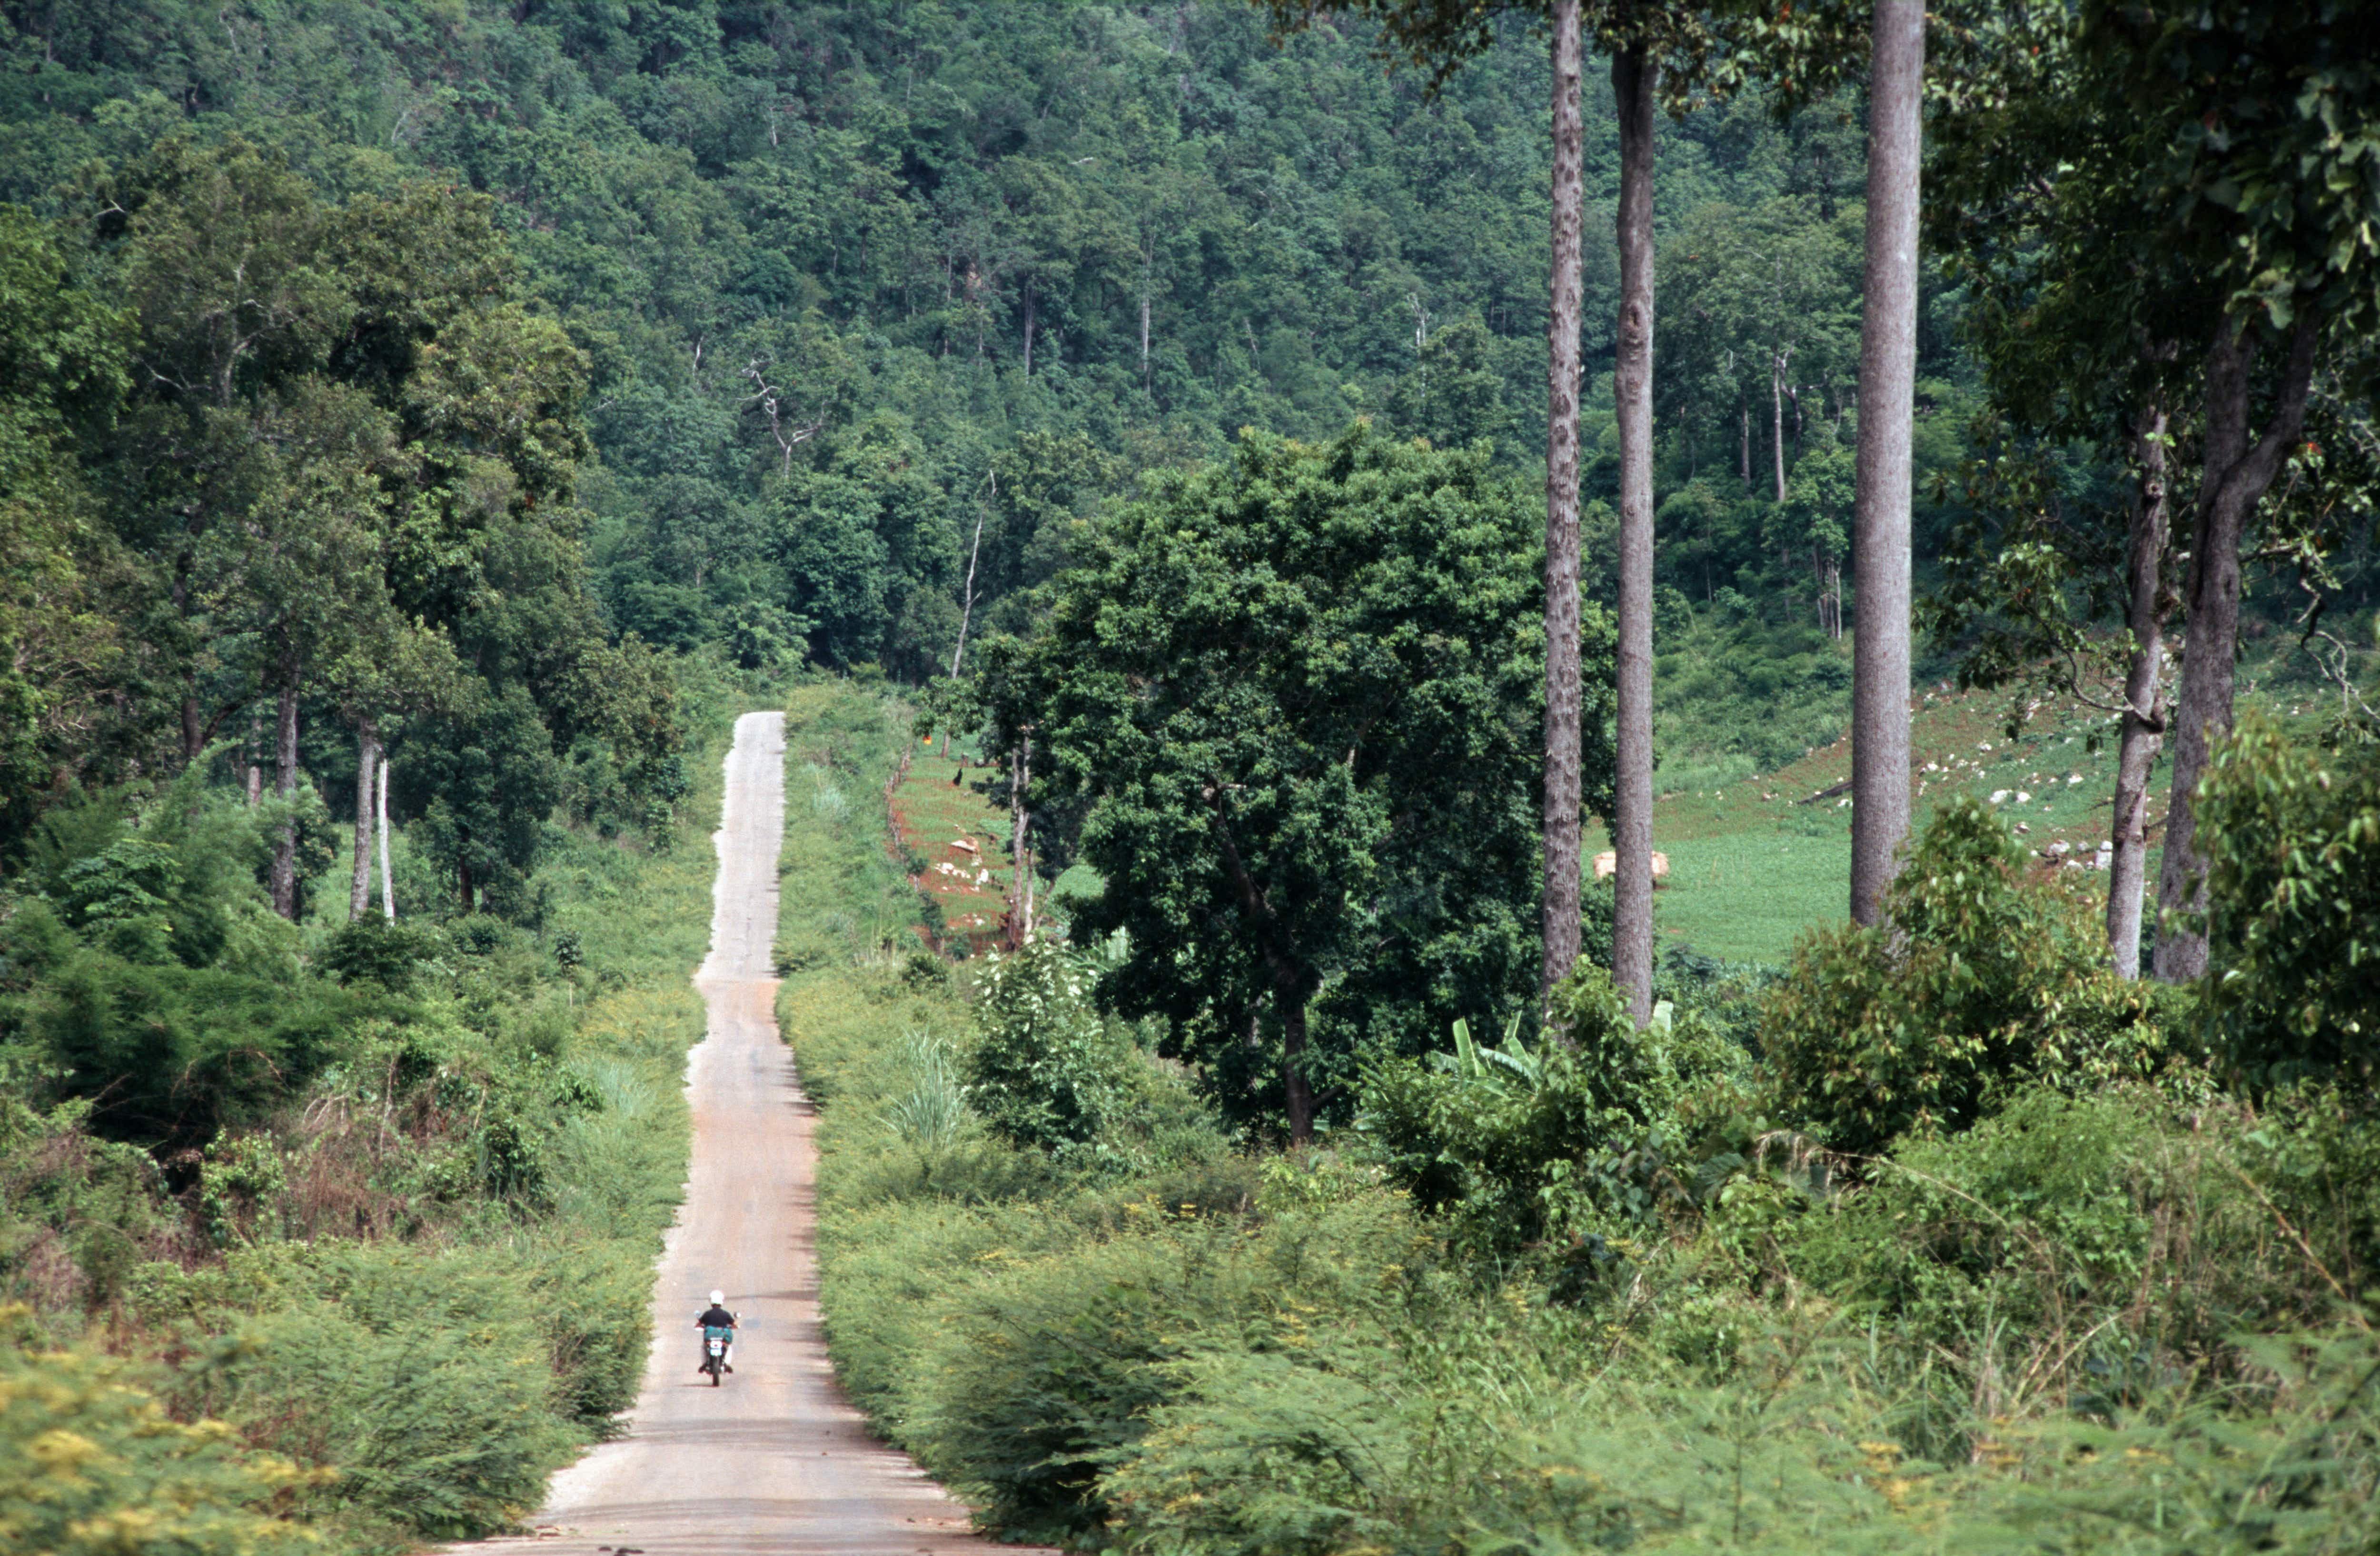 Thailand's best scenic journeys